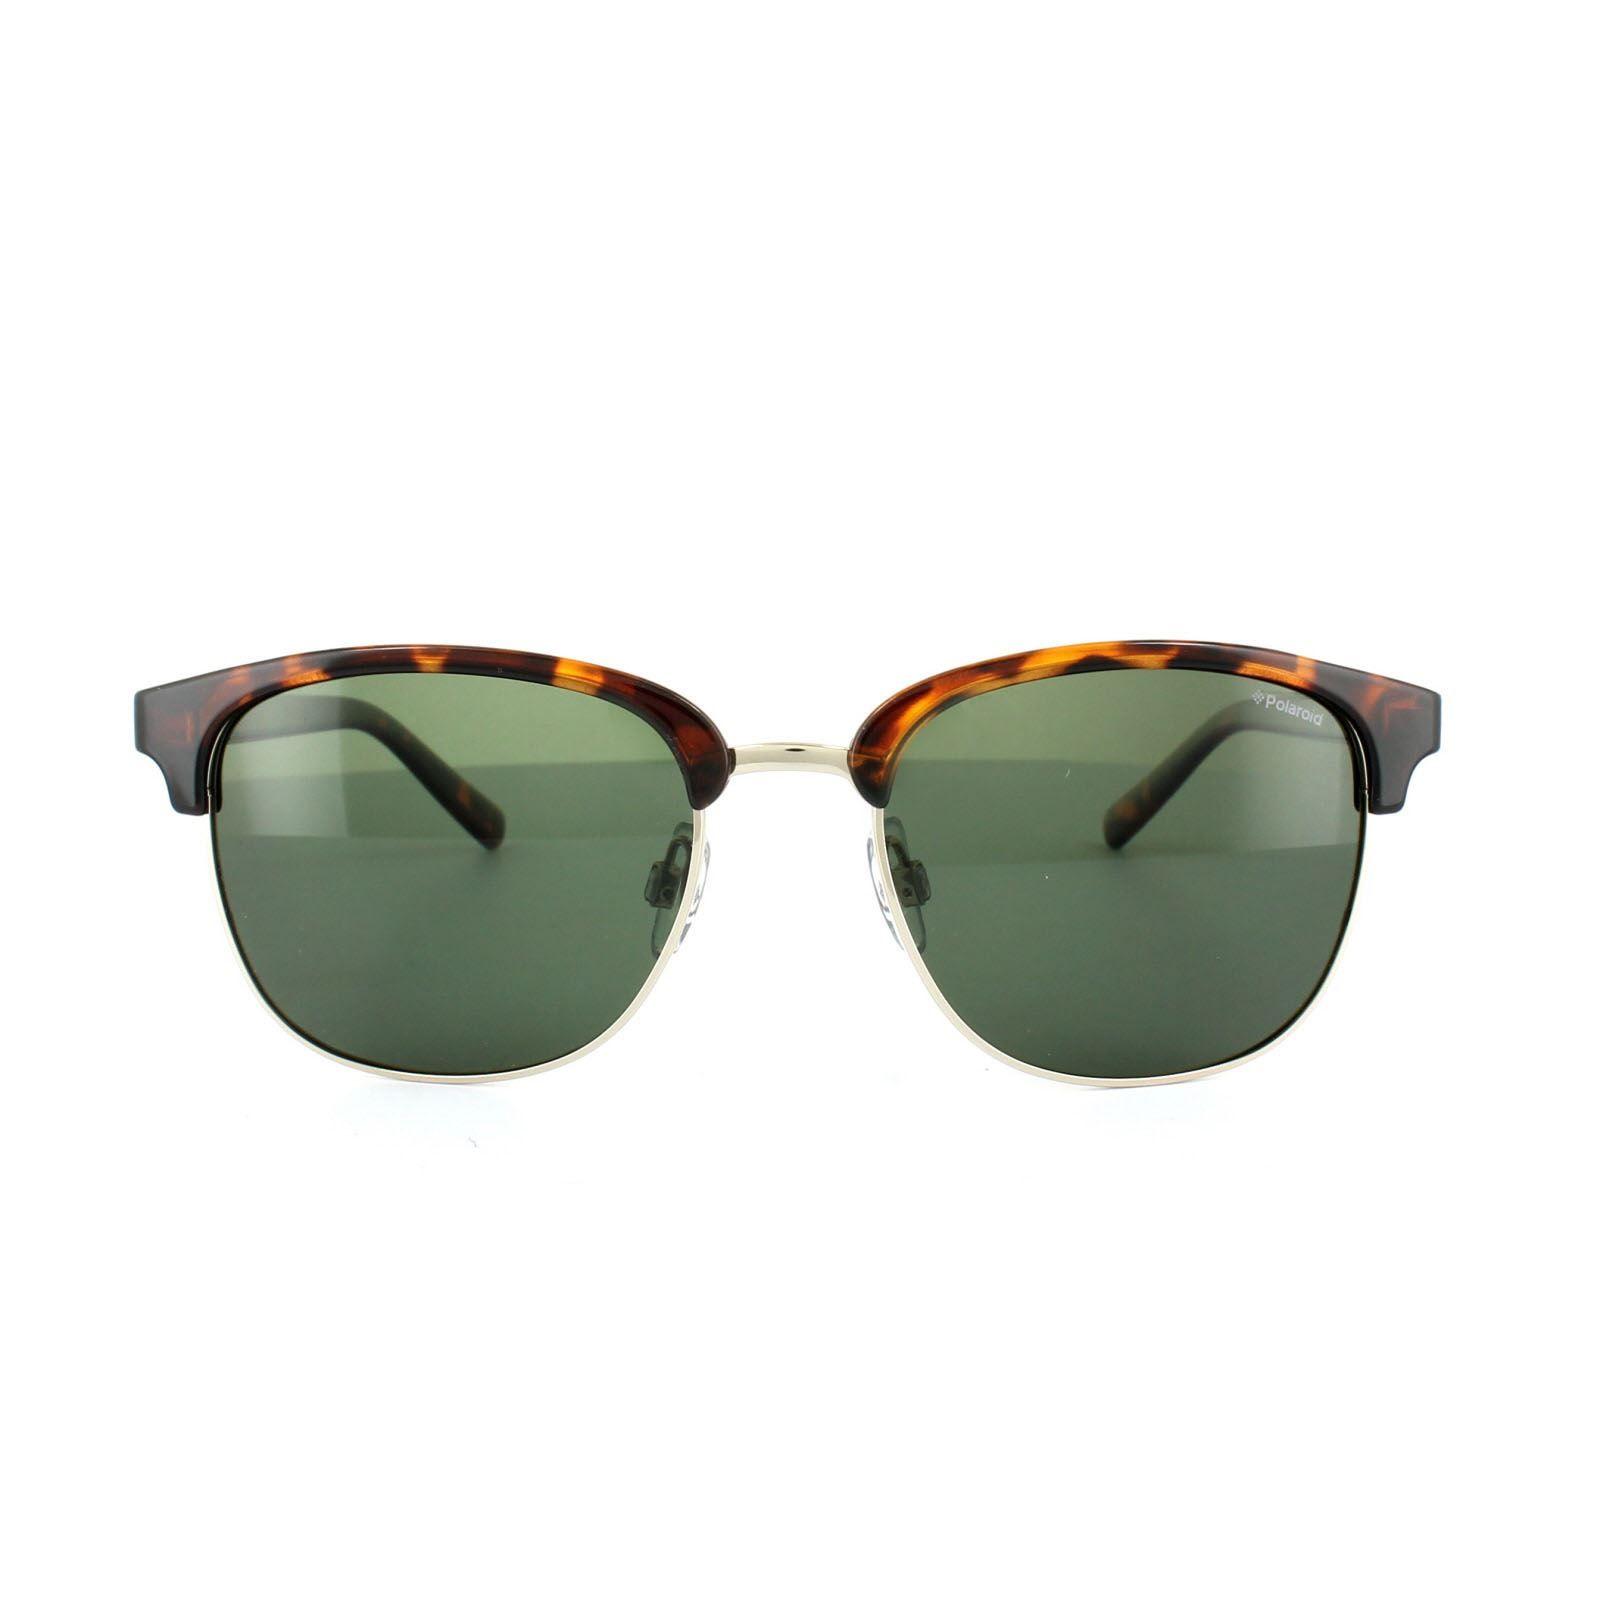 Polaroid Sunglasses 1012/S PR6 H8 Havana Green Polarized